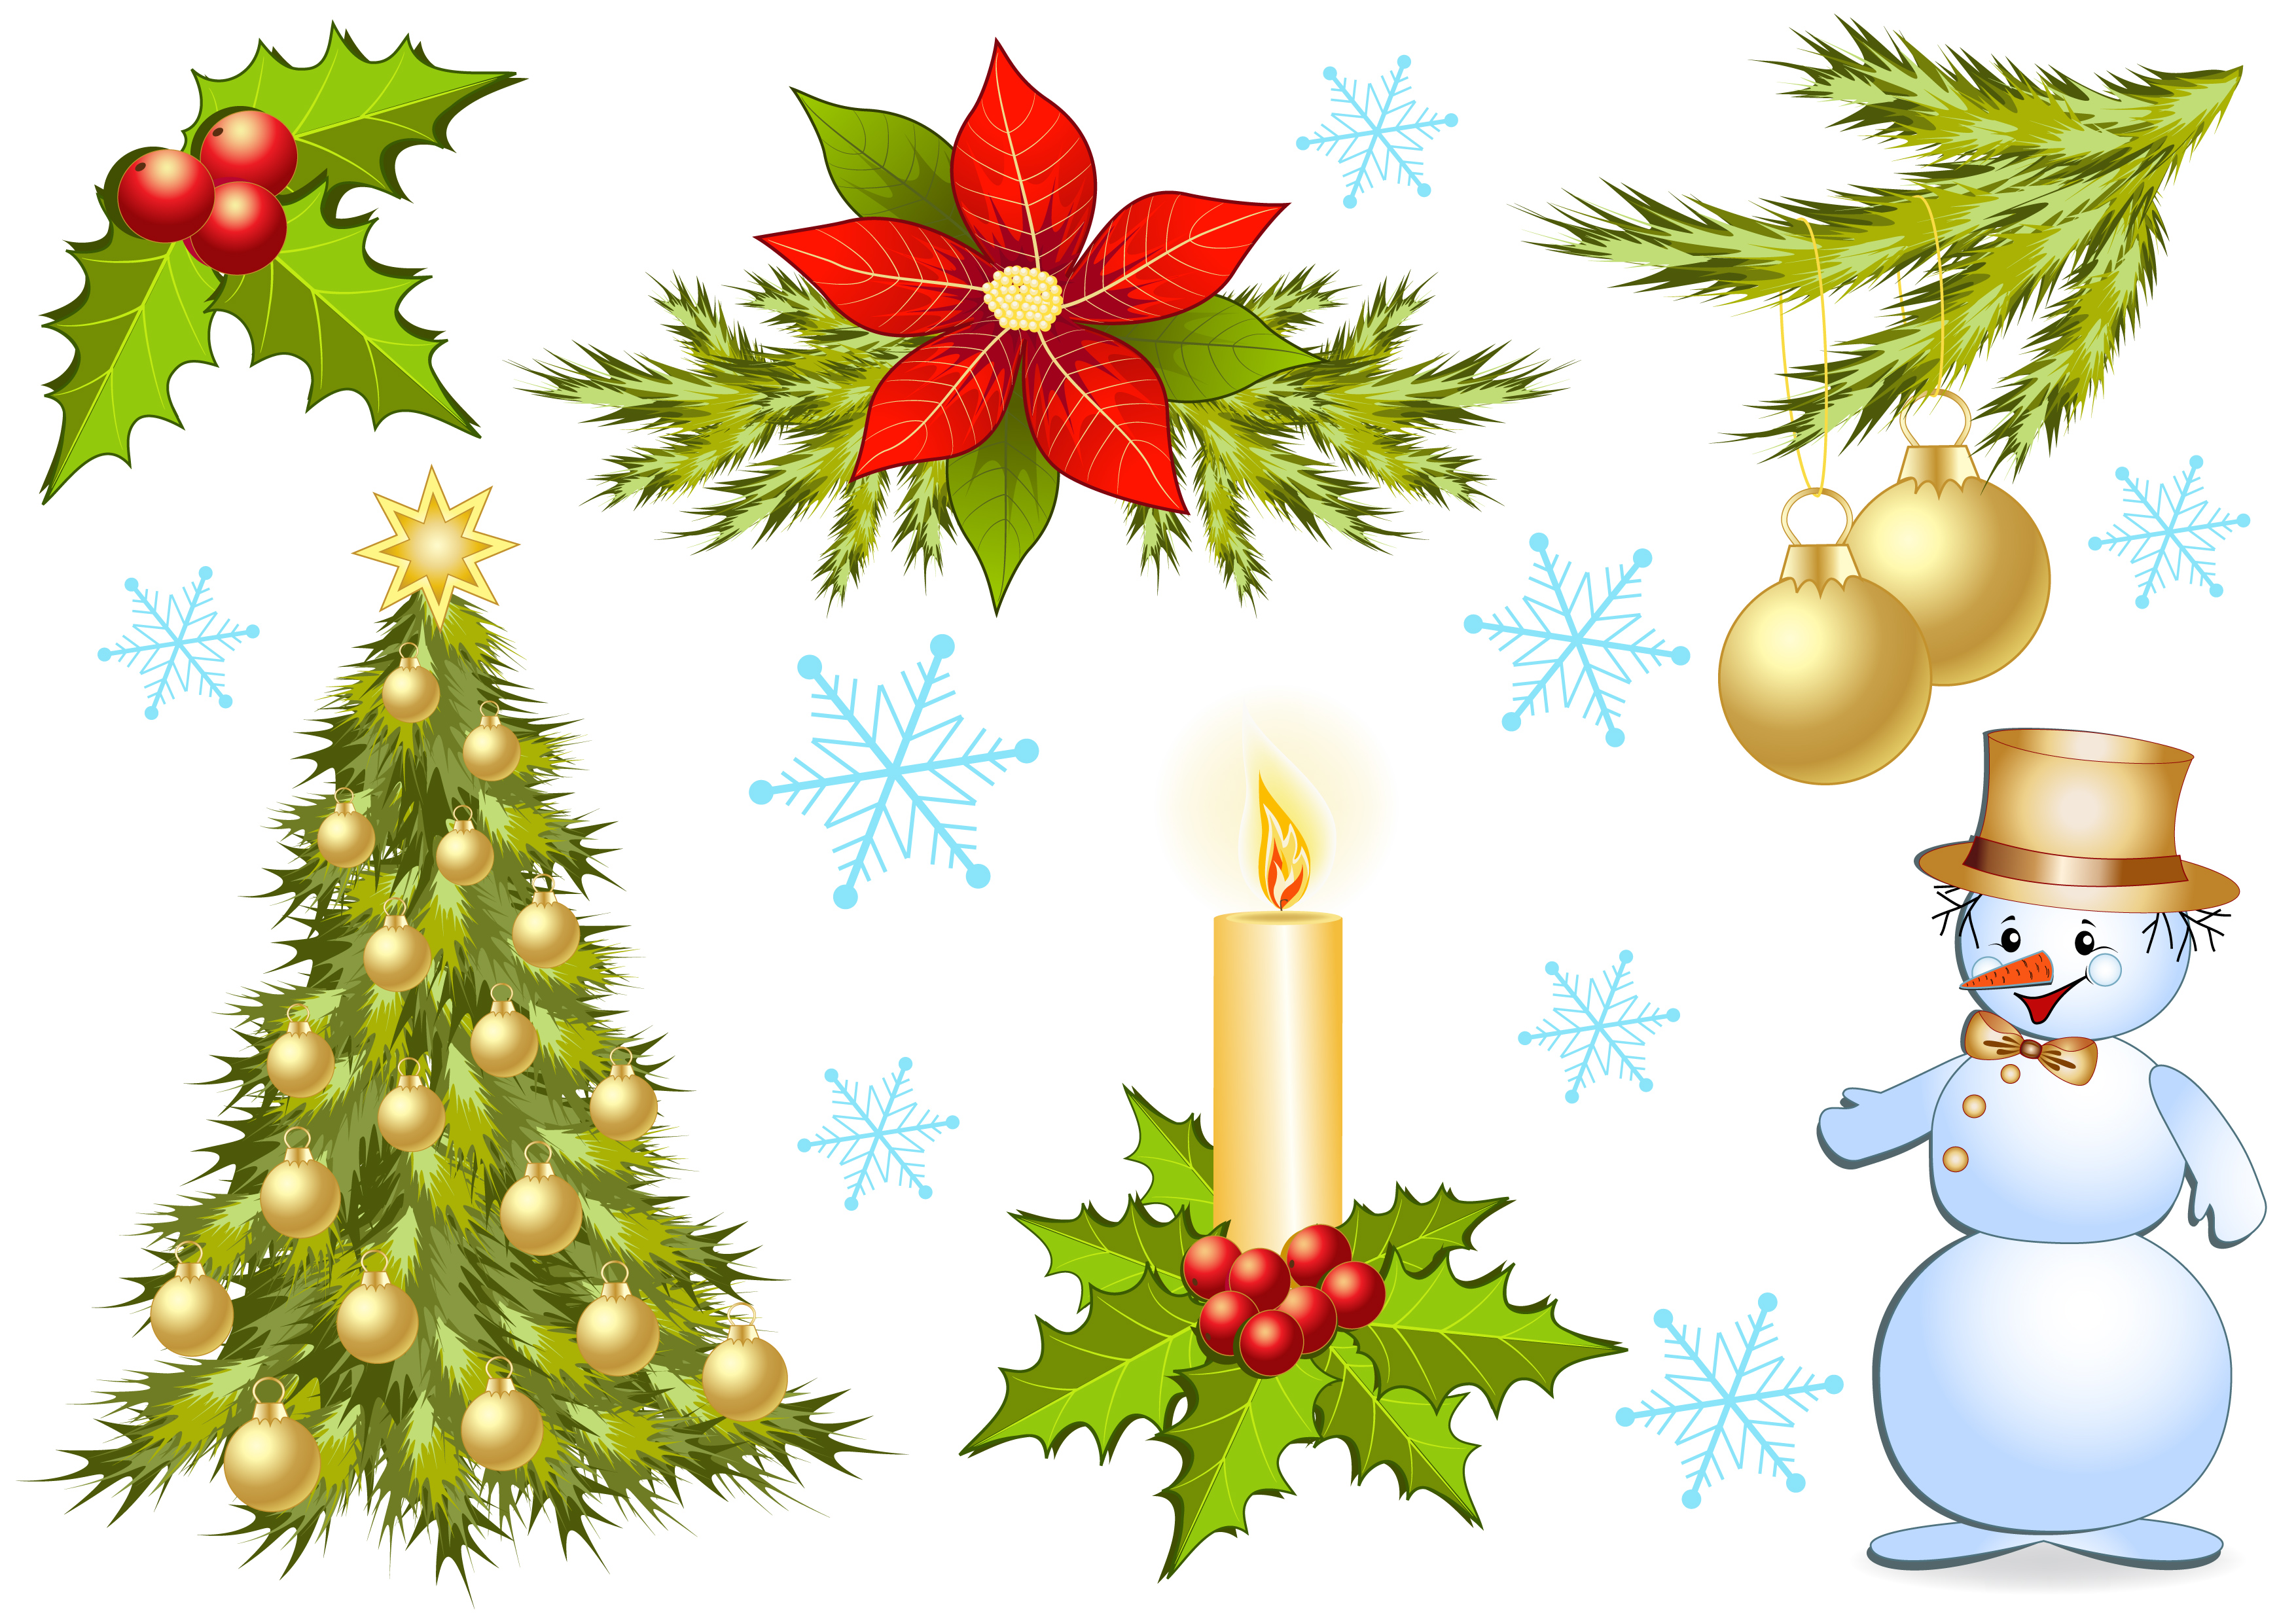 Christmas In Dublin Ca Zoomtm Decorations Vector Free 4vector.